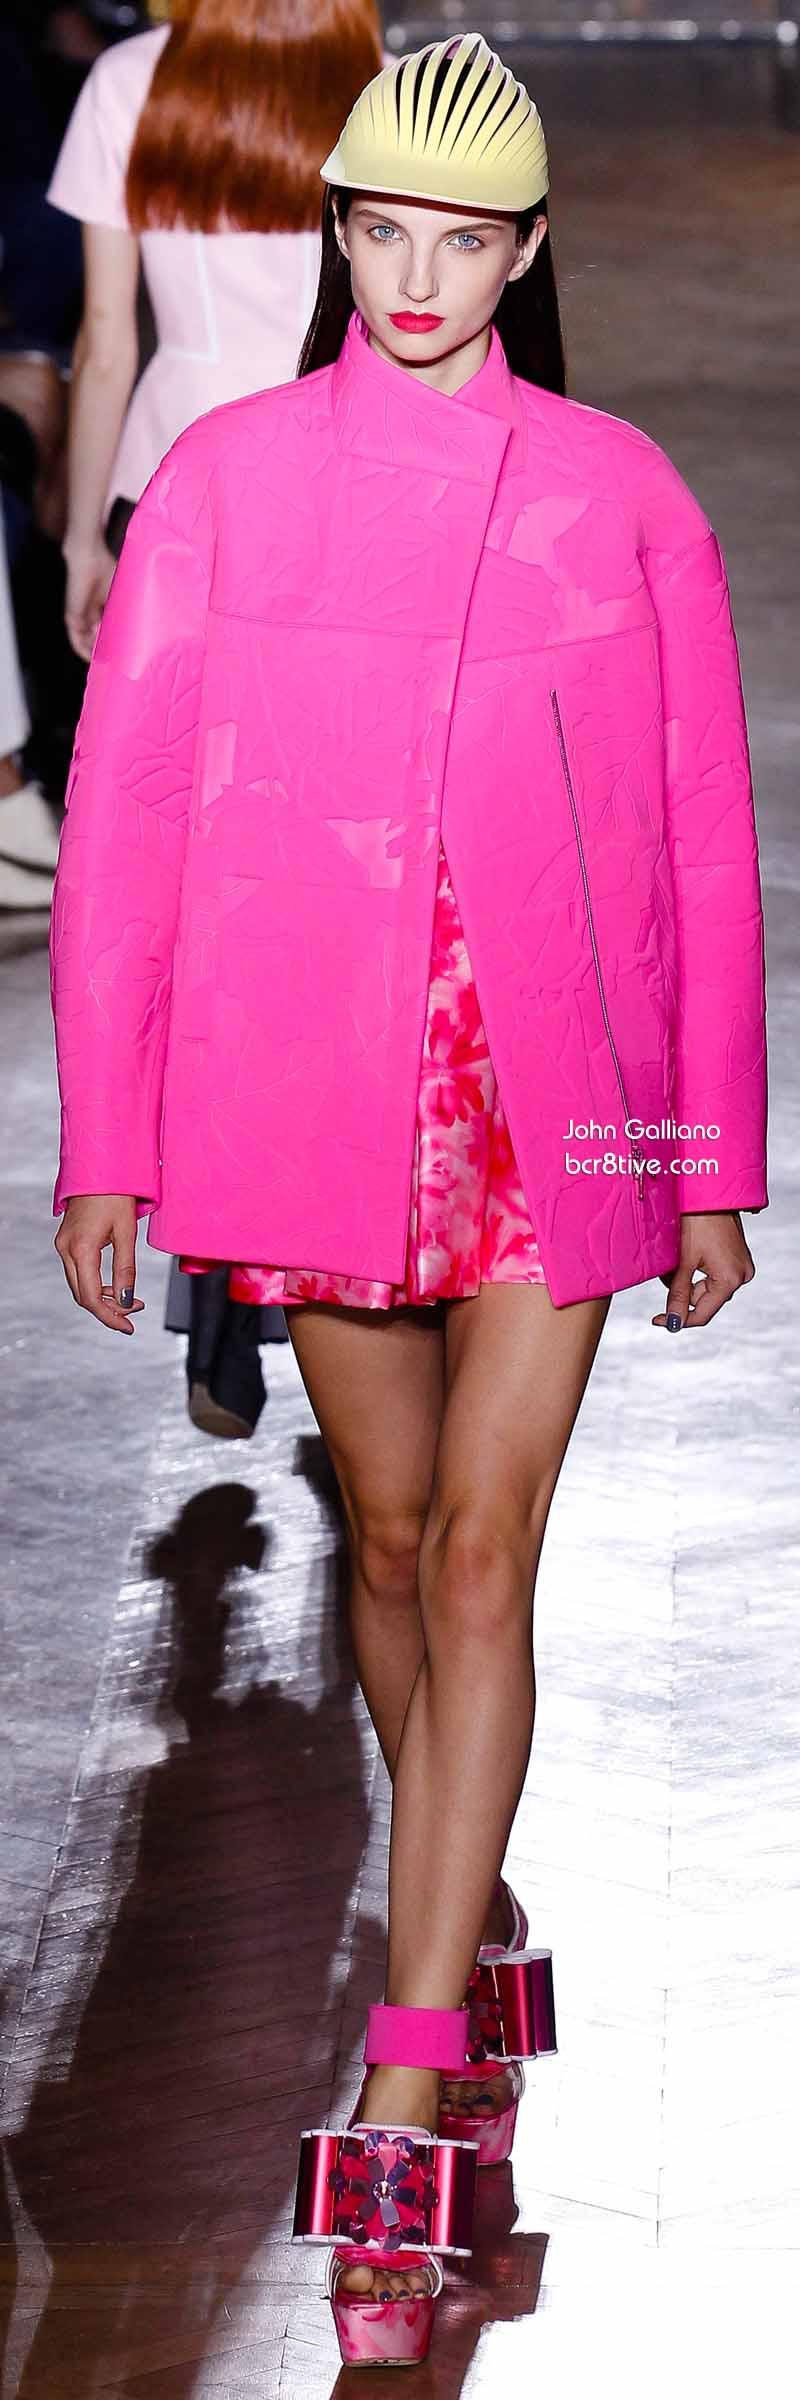 John Galliano - Hot Pink Coat